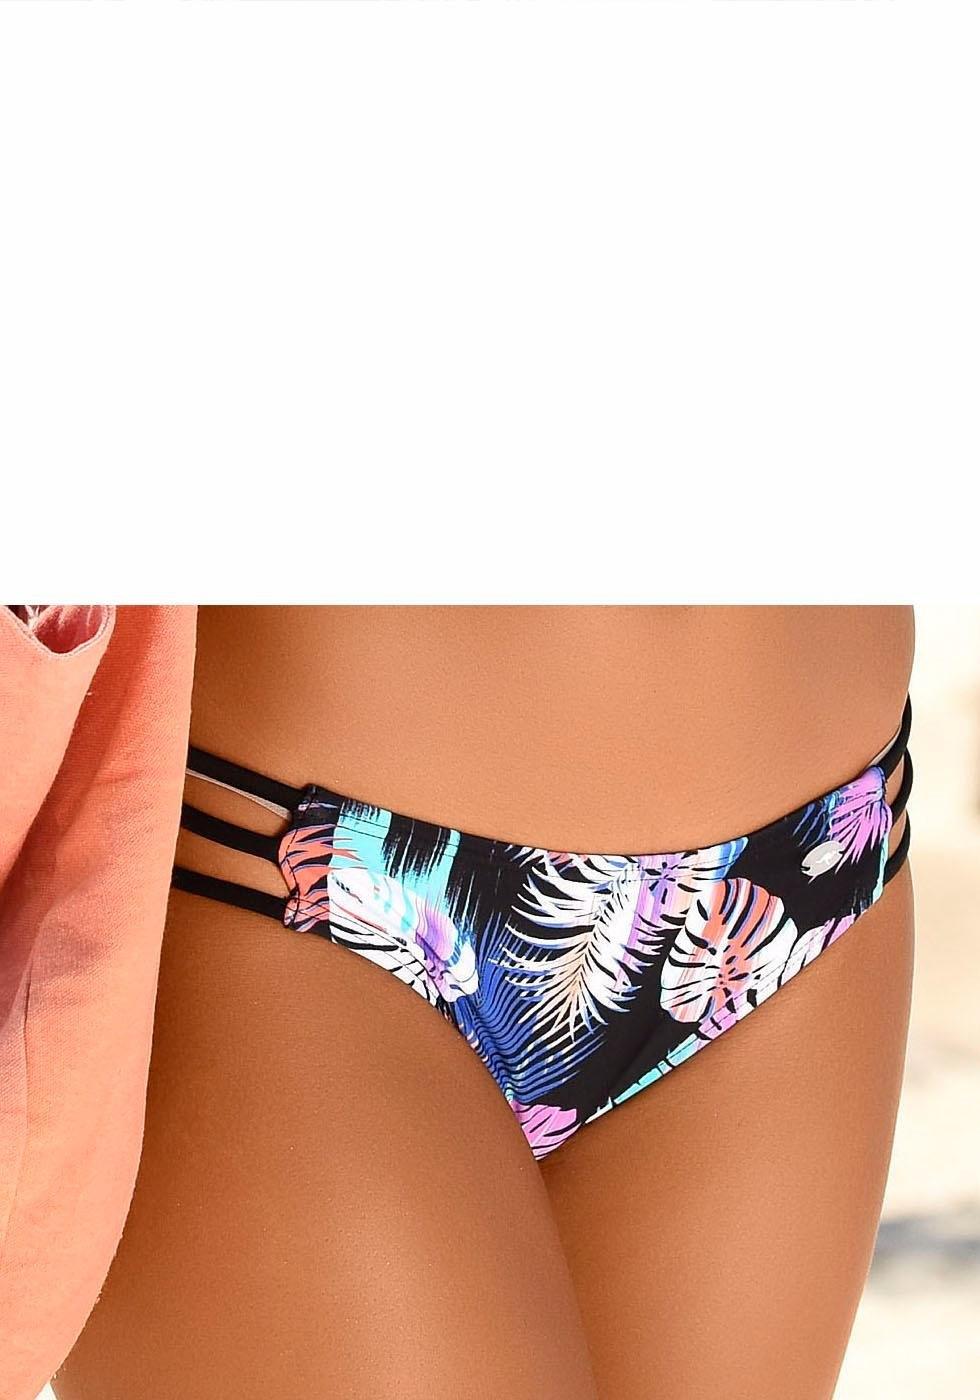 KangaROOS bikinibroekje - gratis ruilen op lascana.nl